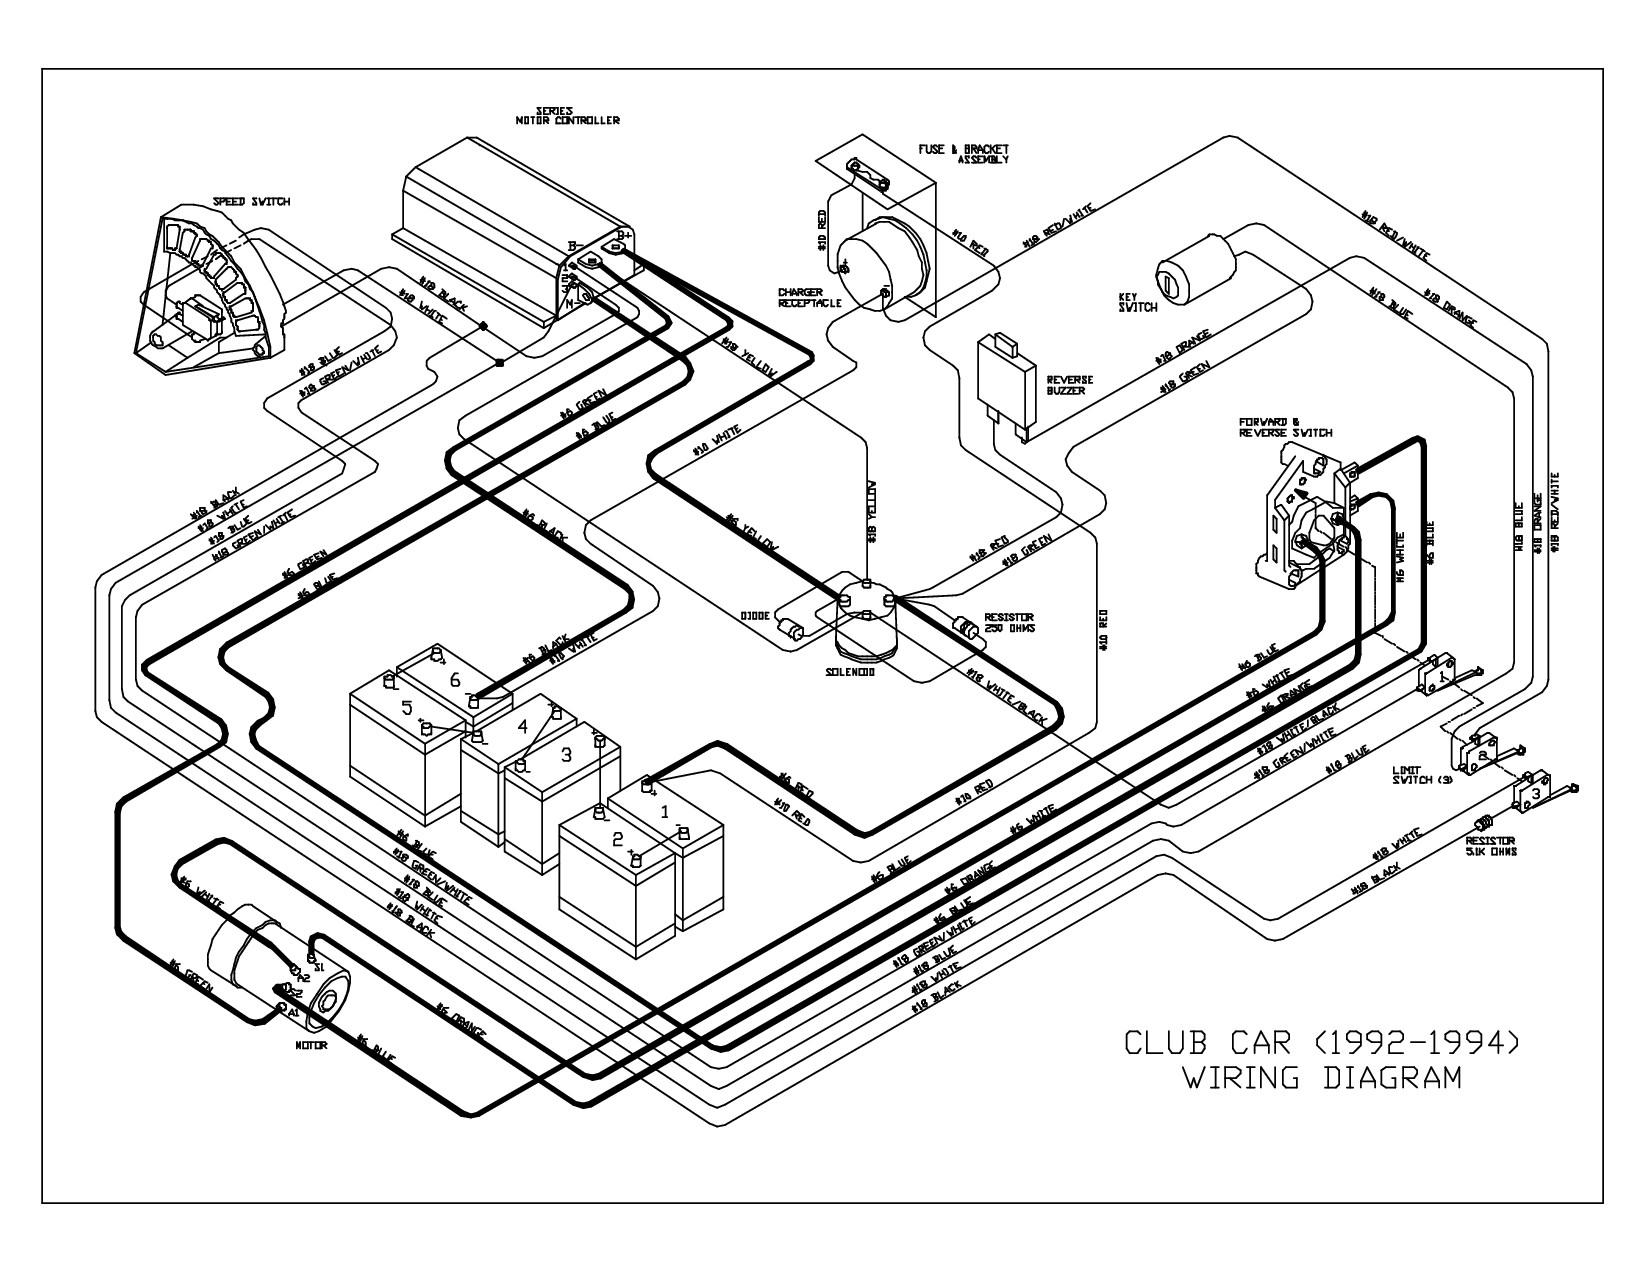 Honda accord 1994 engine diagram automotive wiring diagram 1992 honda accord wiring diagram speed of honda